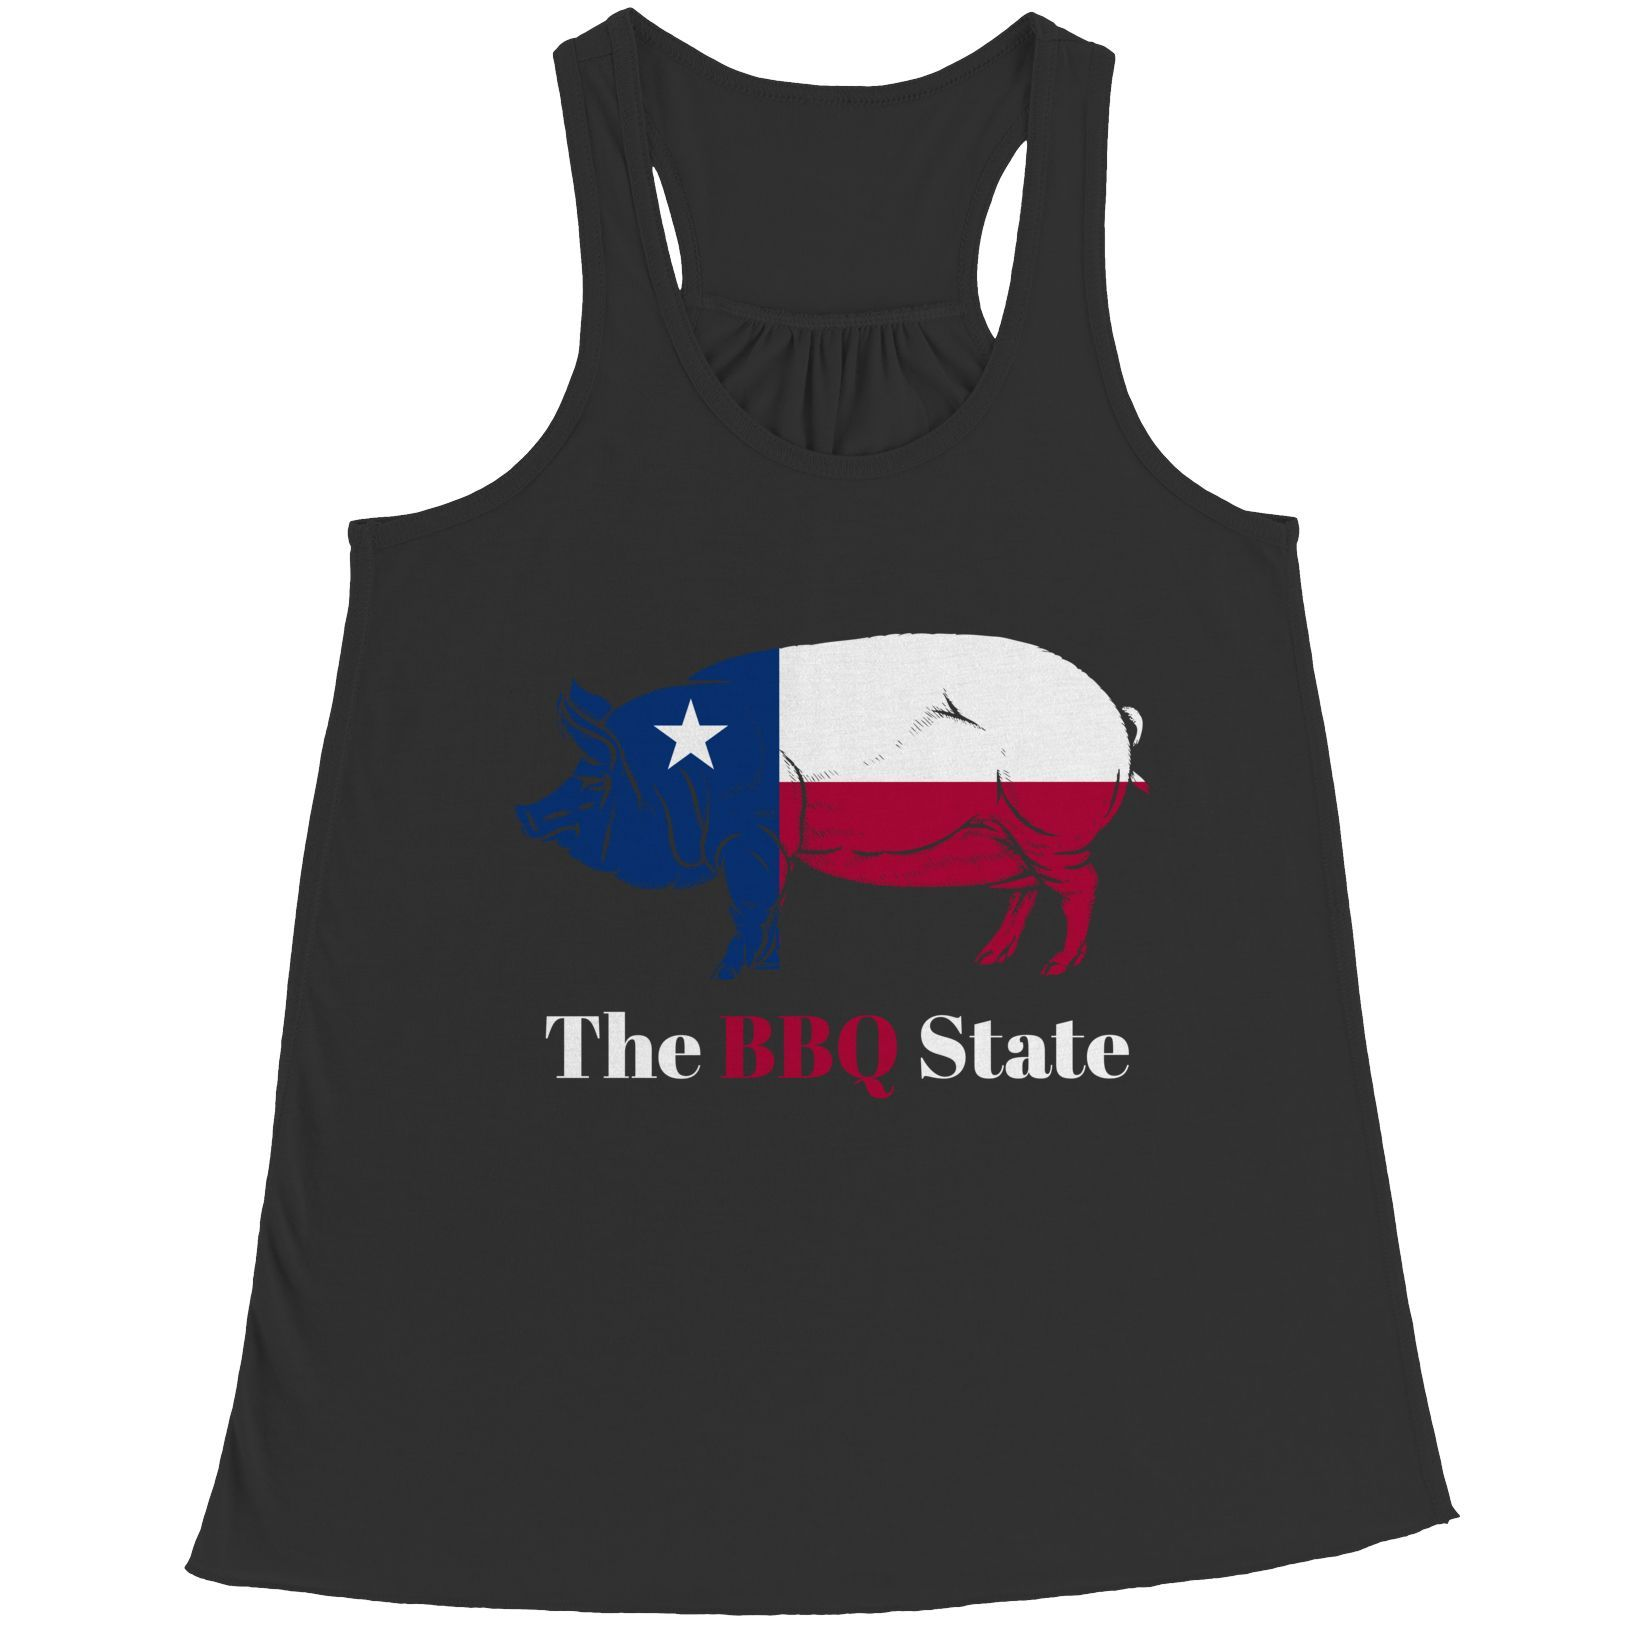 BBQ State - Dallas, Texas- Bella Flowy Racerback Tank